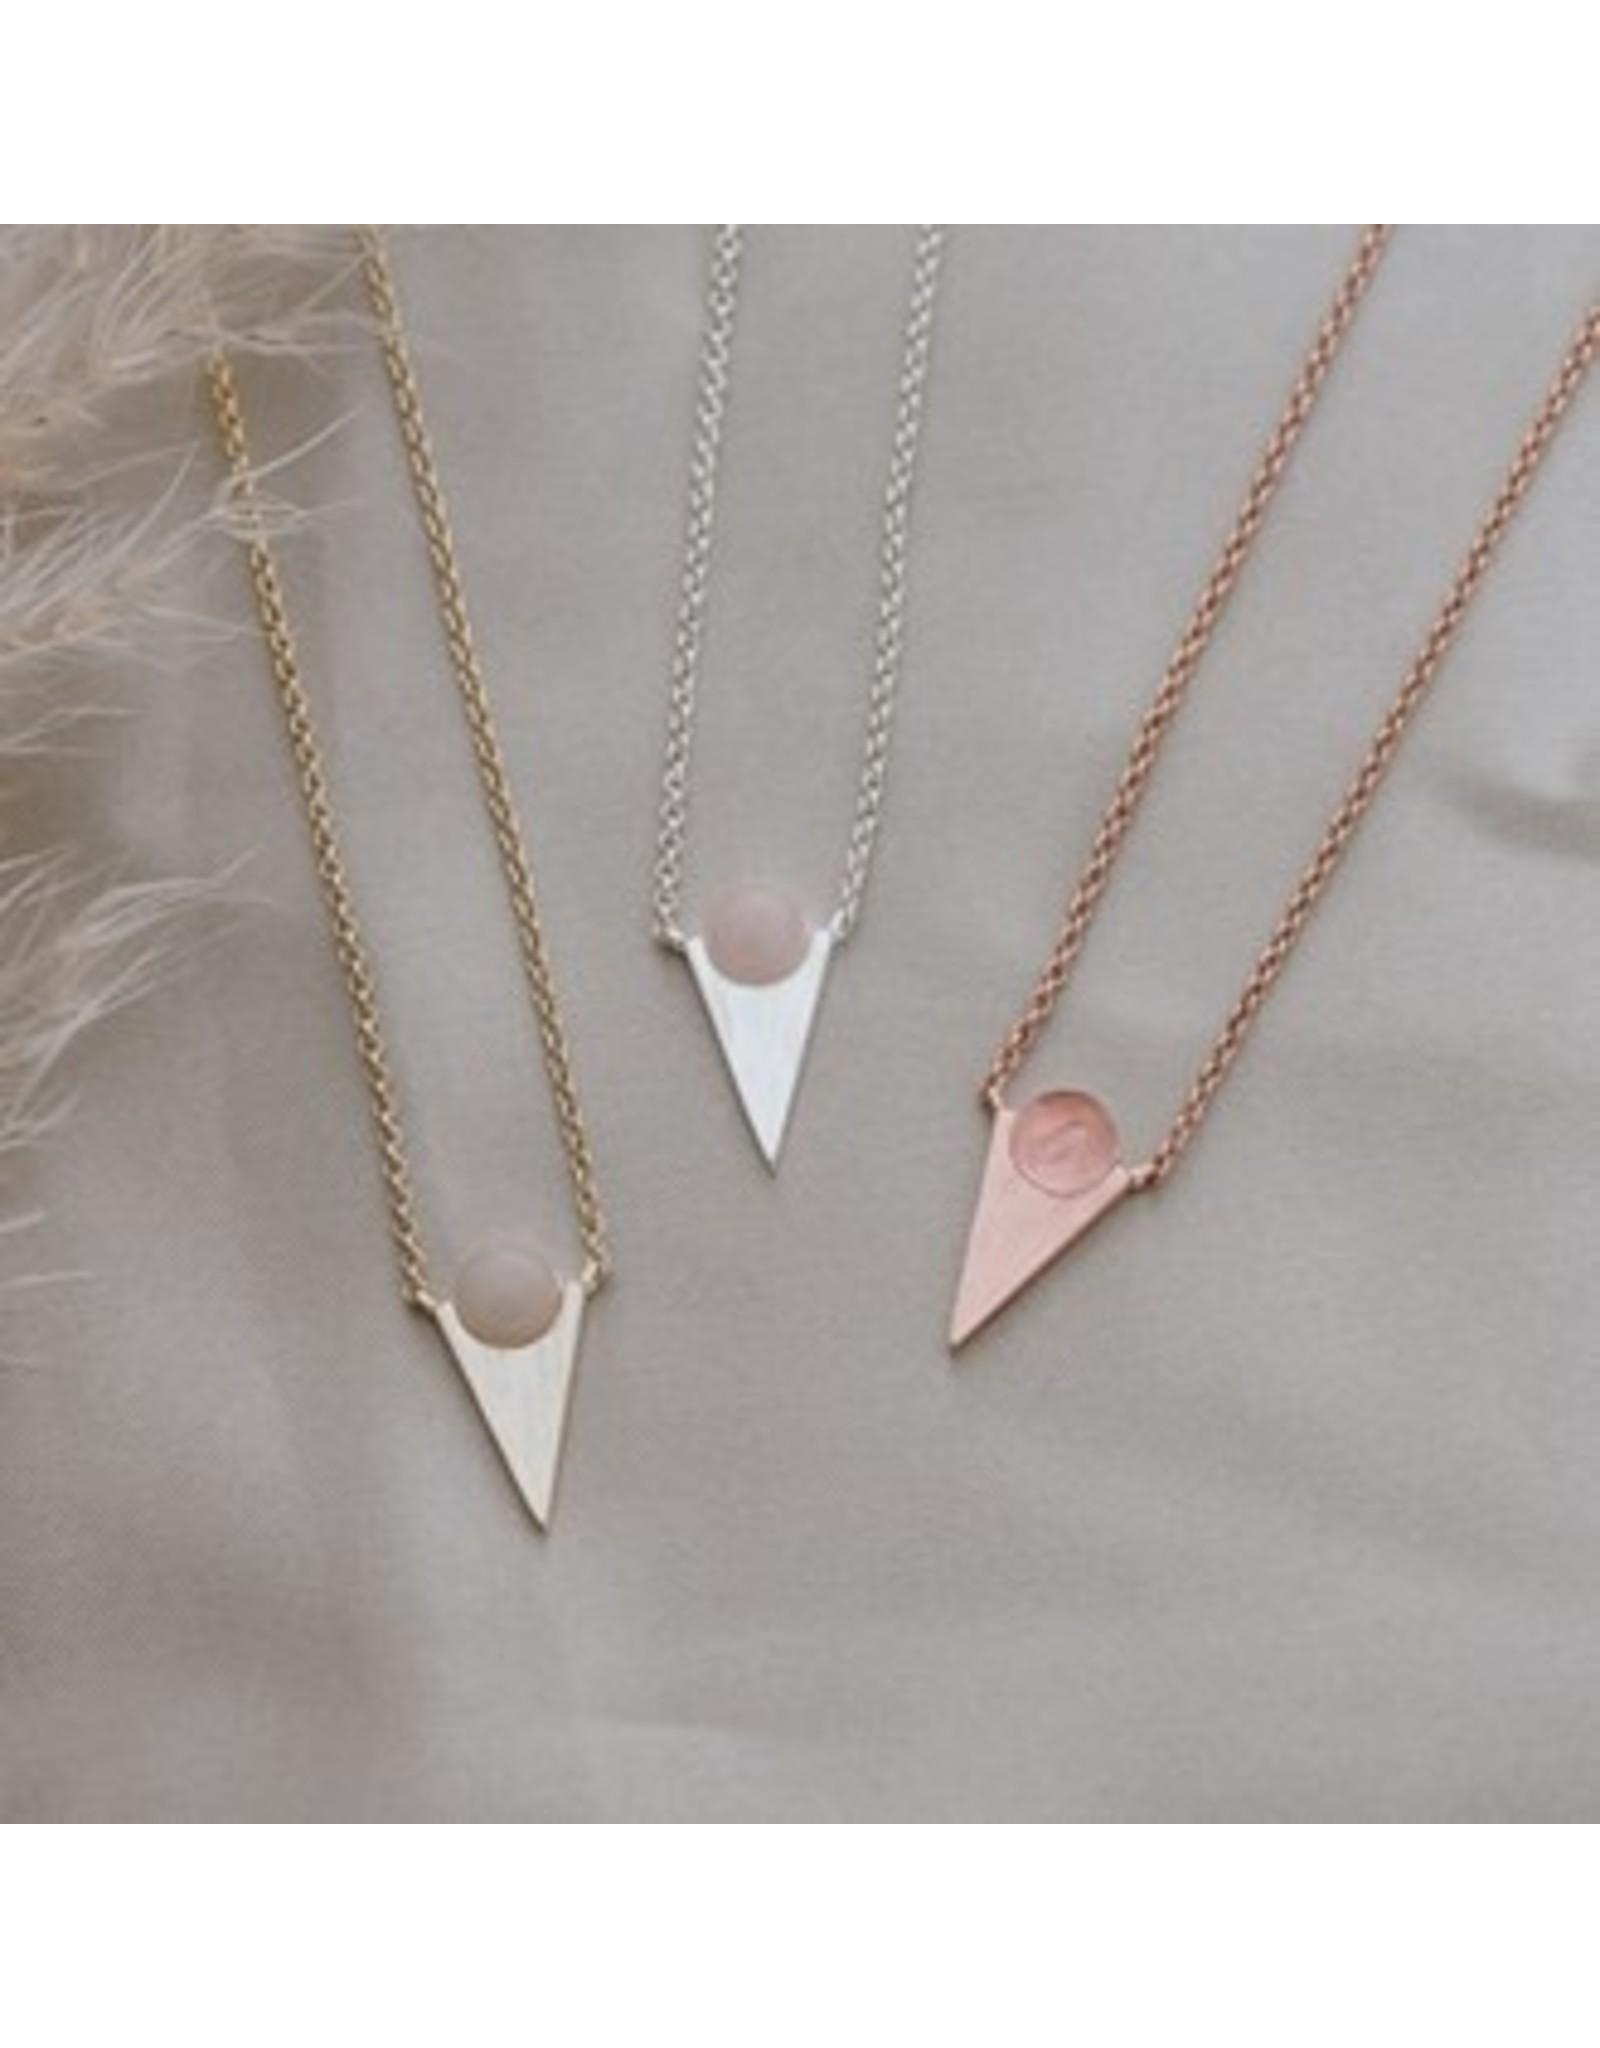 Glee jewelry Moon Child Necklace/Rose Quartz/Rose Gold